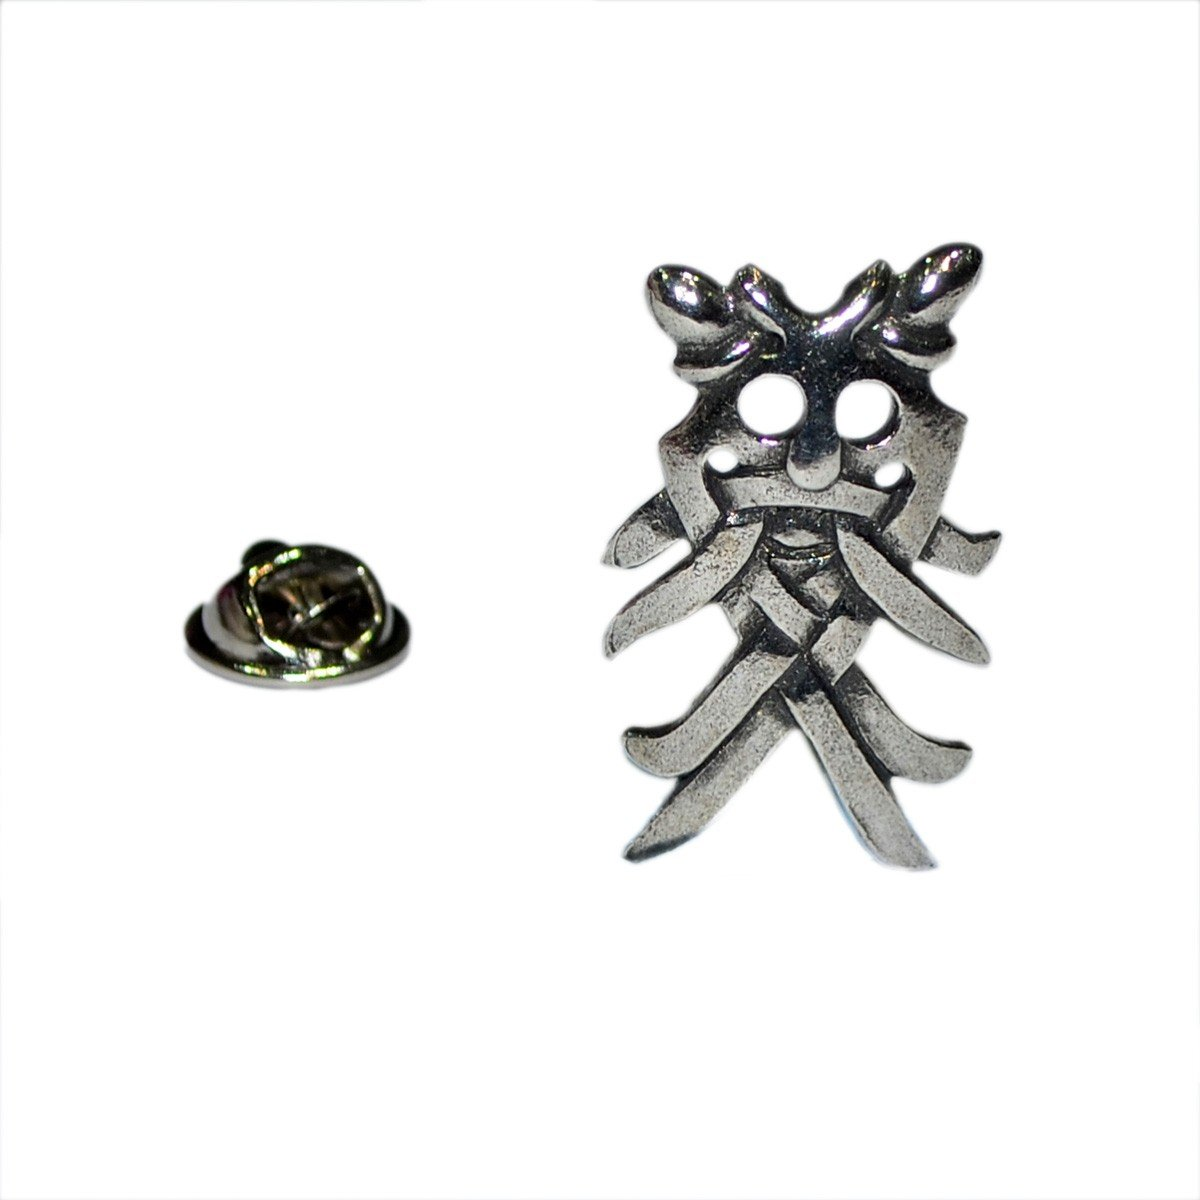 Pin de Solapa La Máscara Vikinga de Odin: Amazon.es: Joyería